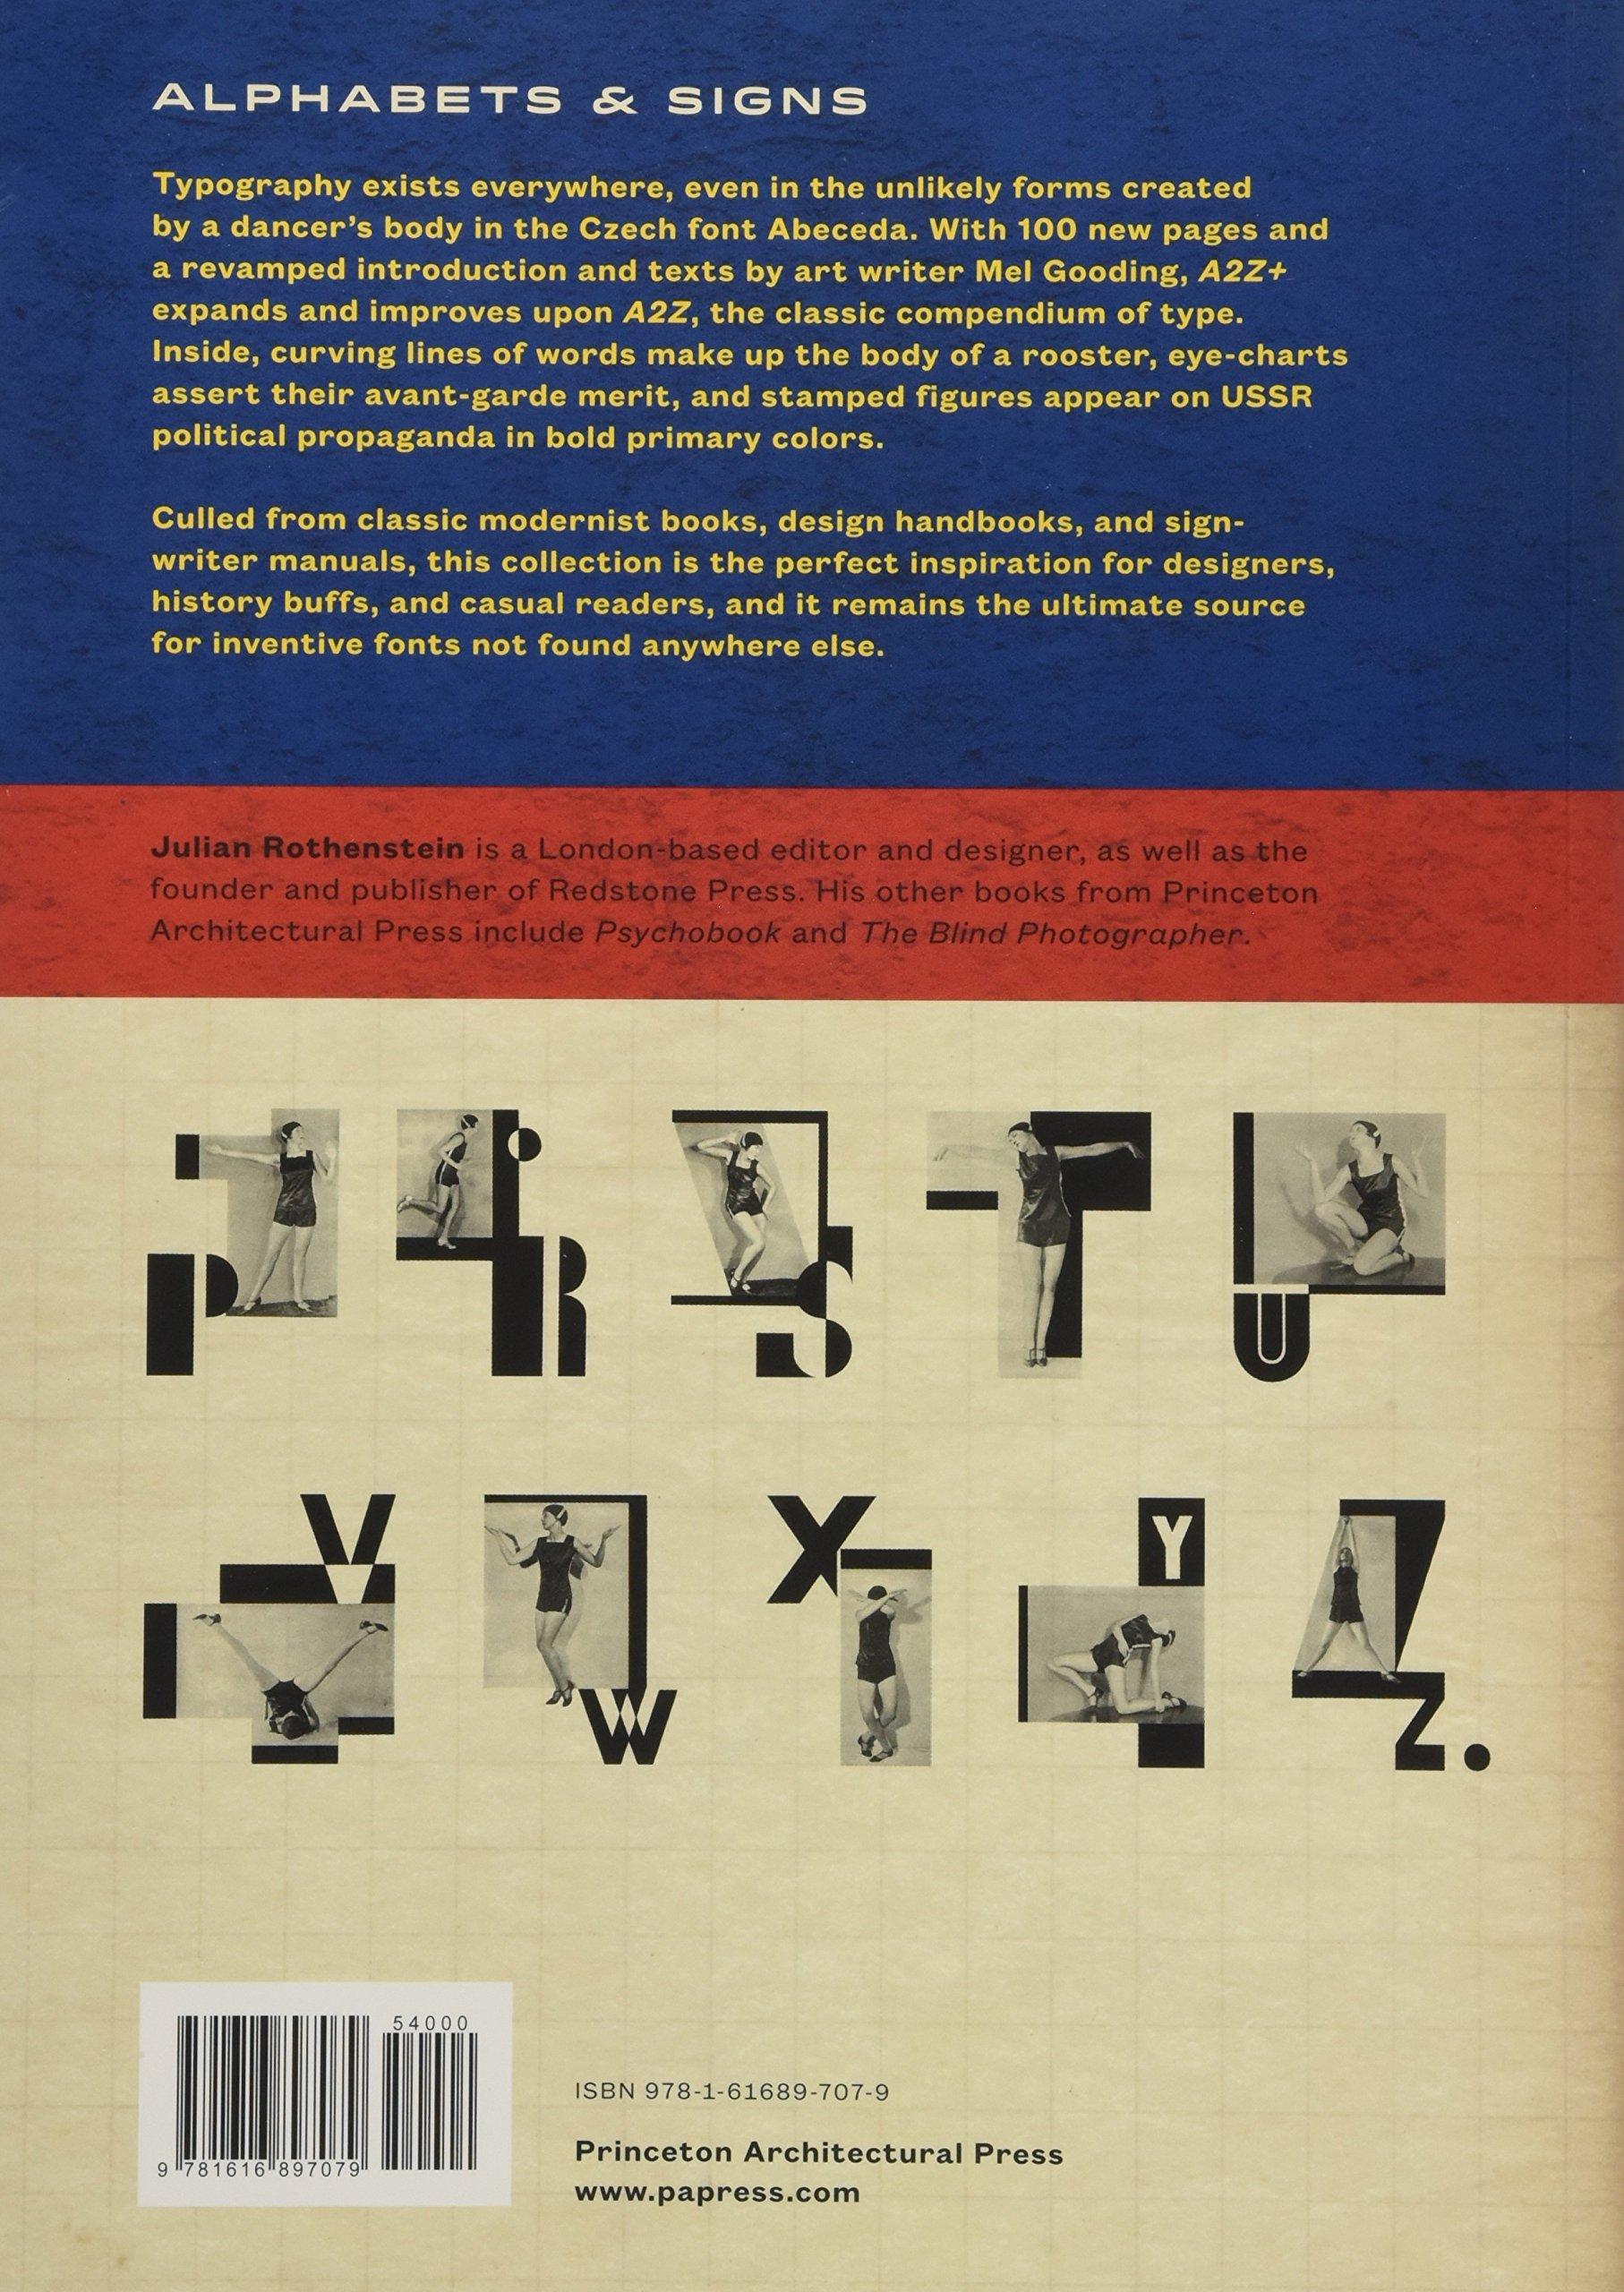 A2z+: Alphabets & Signs: Amazon.co.uk: Mel Gooding, Julian Rothenstein:  9781616897079: Books